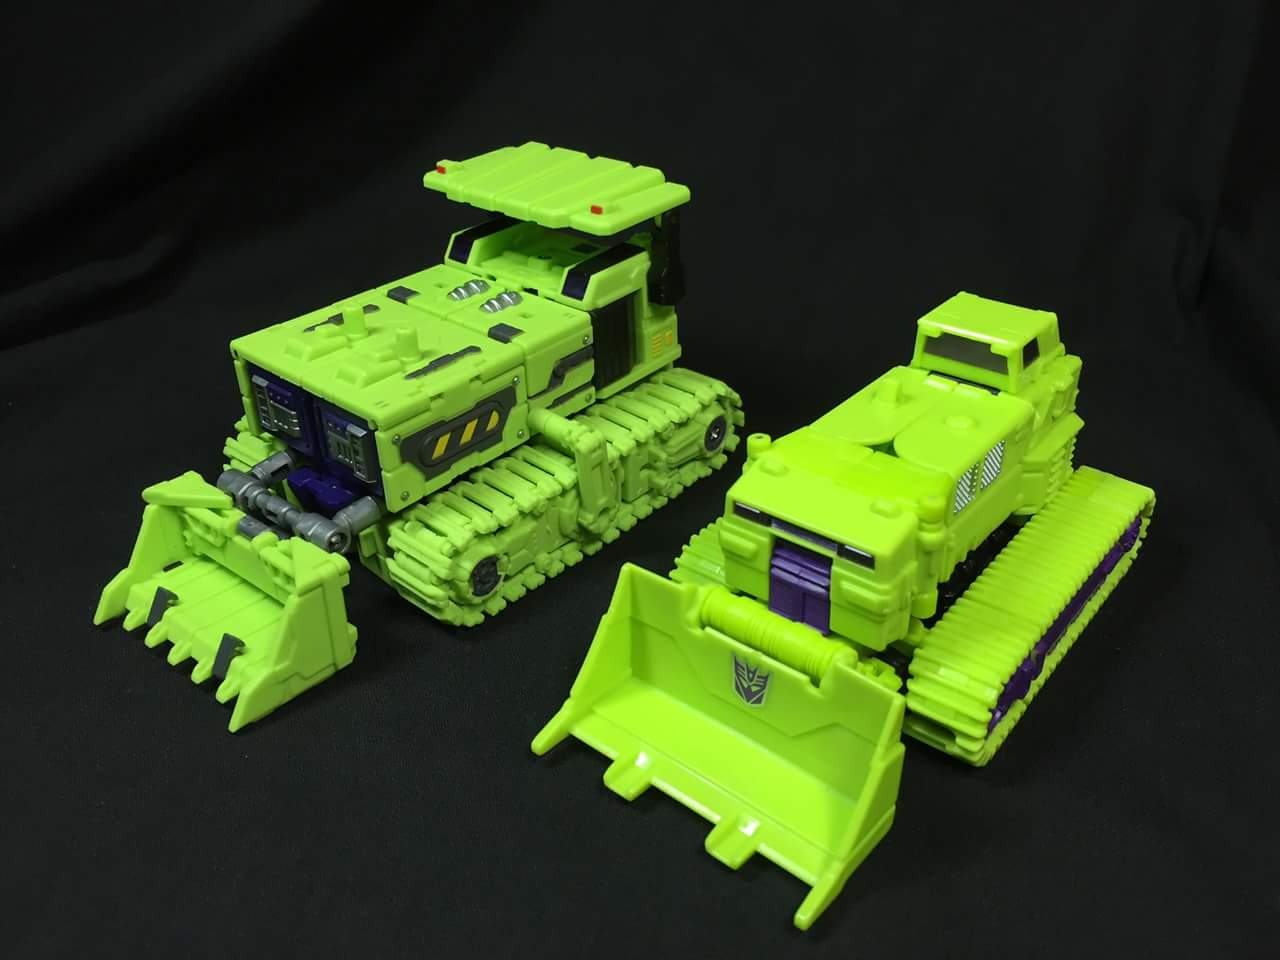 [Toyworld] Produit Tiers - Jouet TW-C Constructor aka Devastator/Dévastateur (Version vert G1 et jaune G2) - Page 3 1aKn9lhH